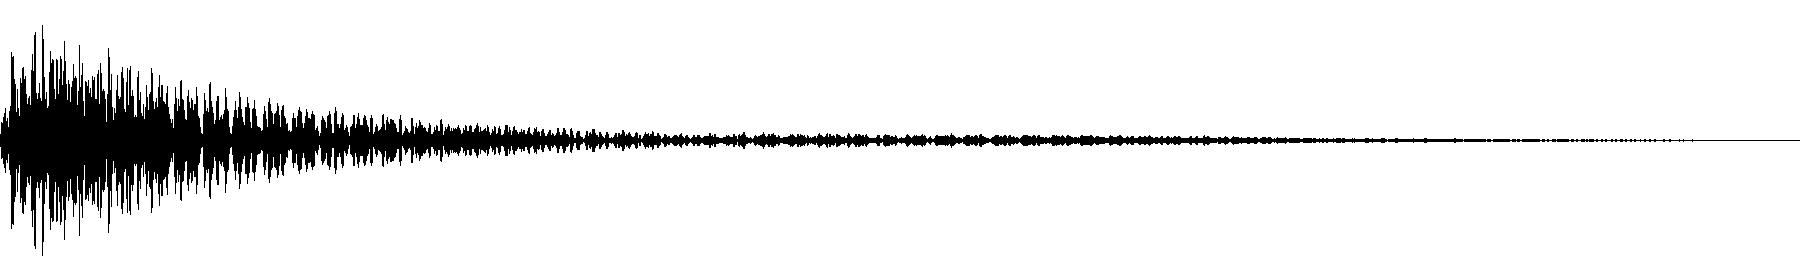 vedh synth cut 246 gm